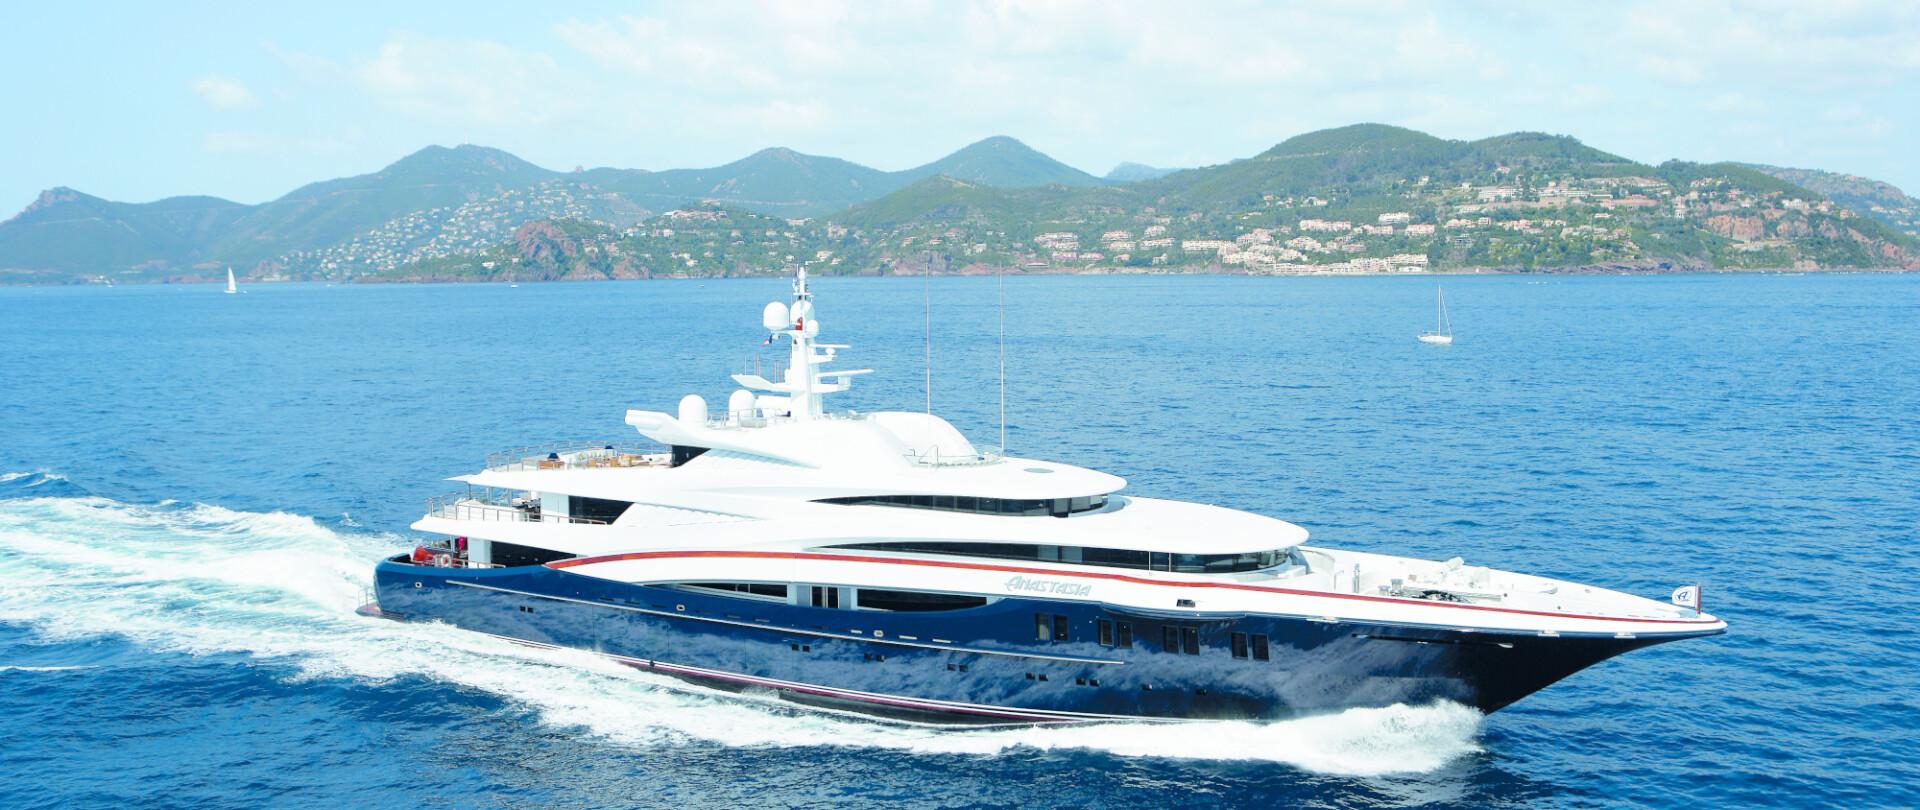 Singapore Yacht Show 2015